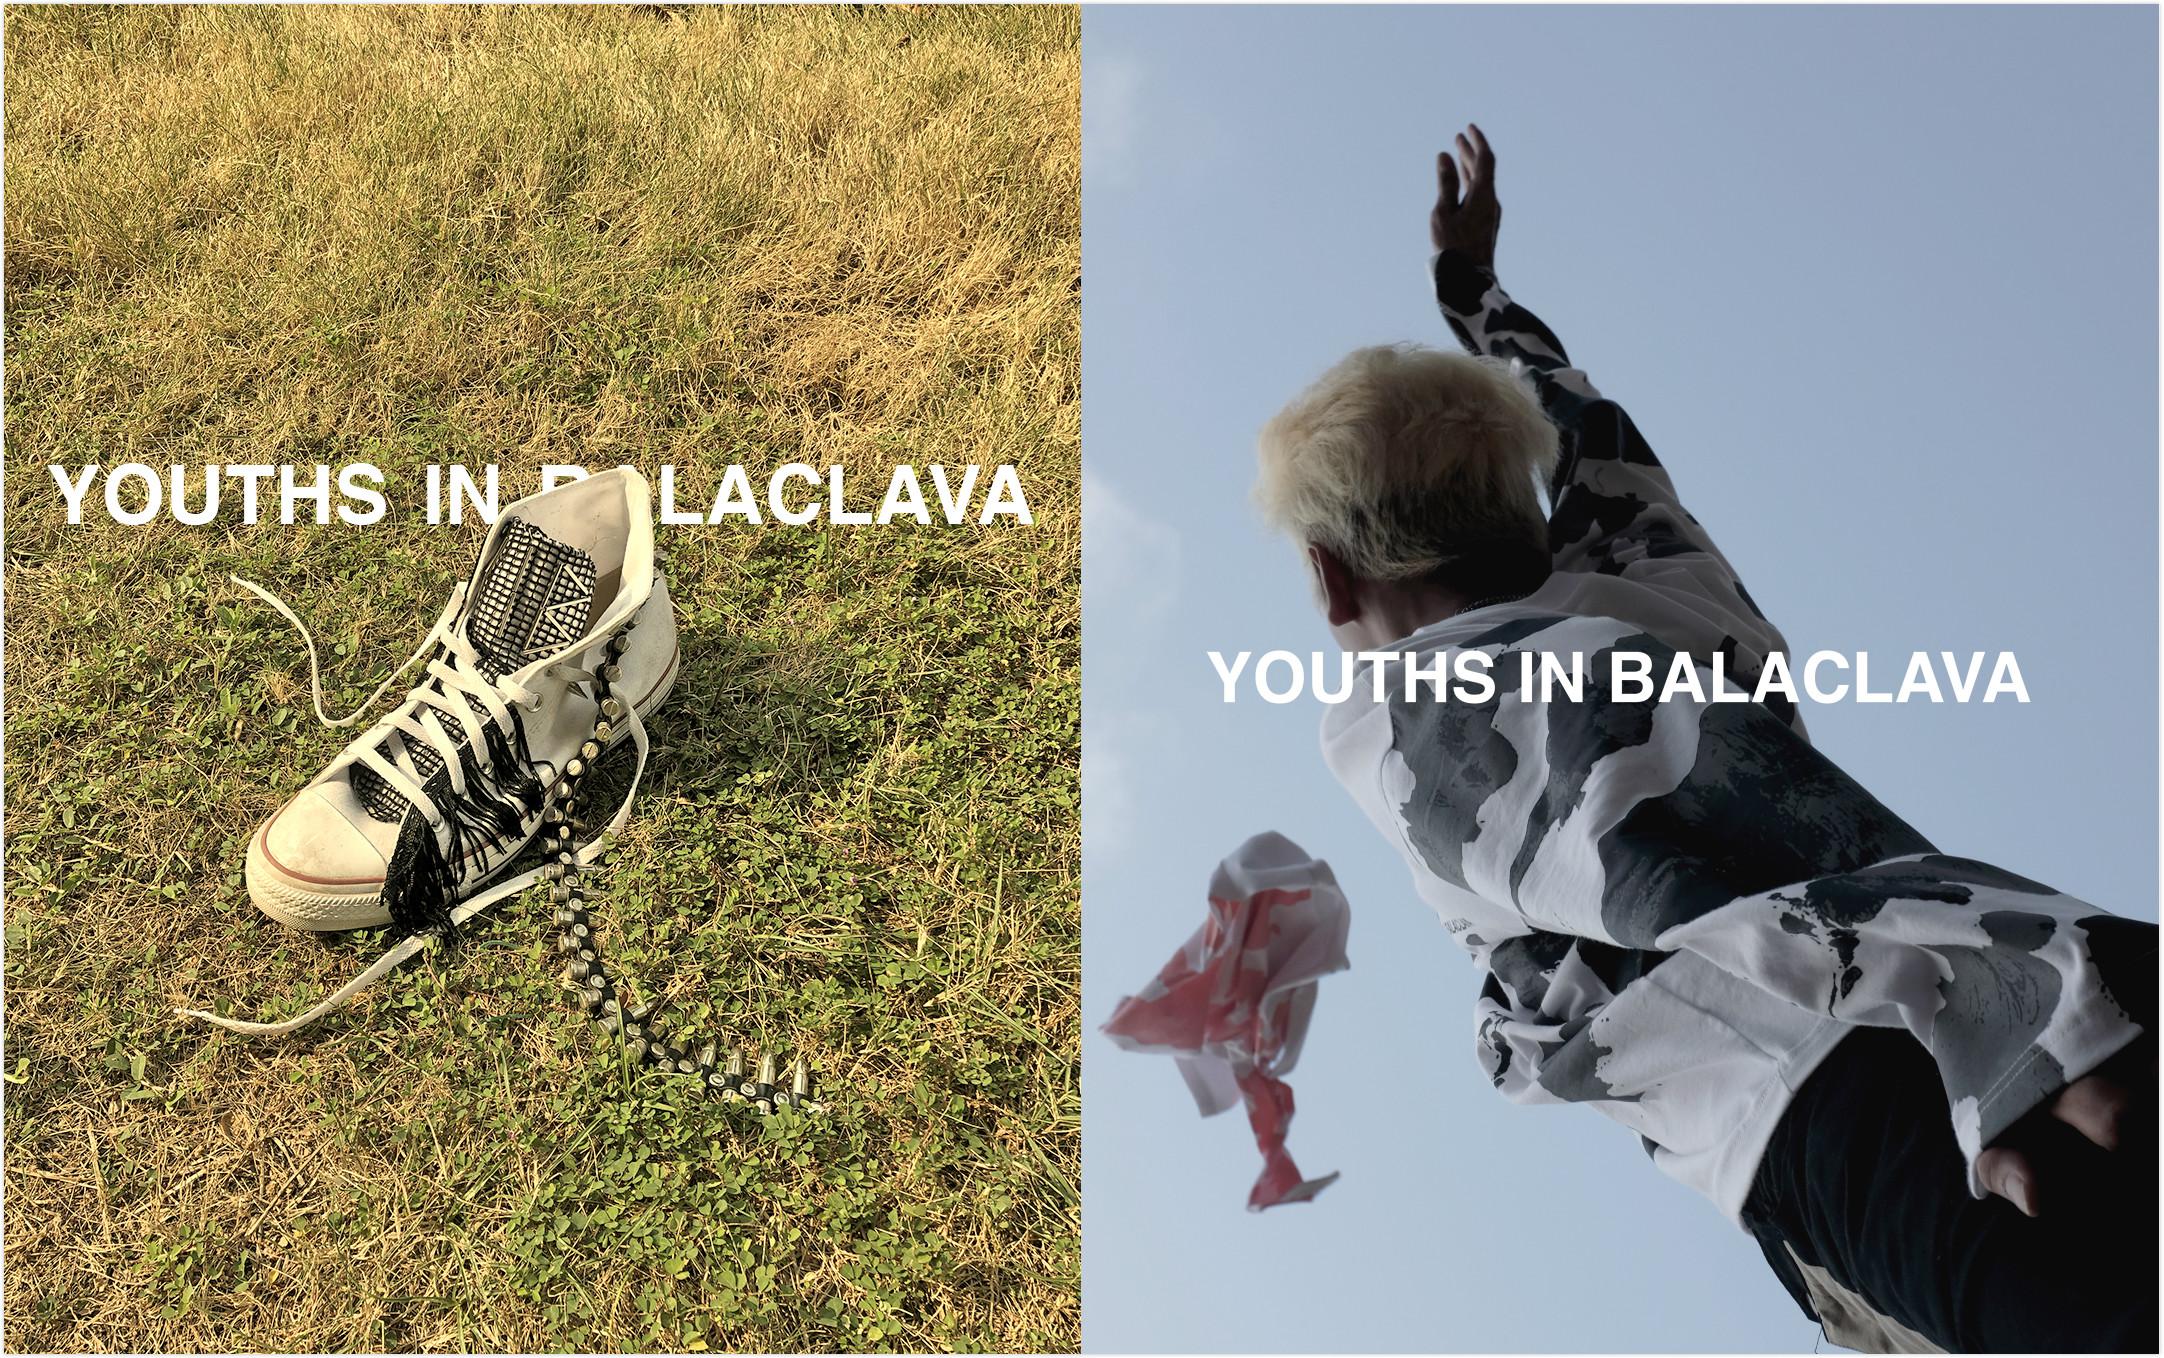 New Season visual from Youths in Balaclava